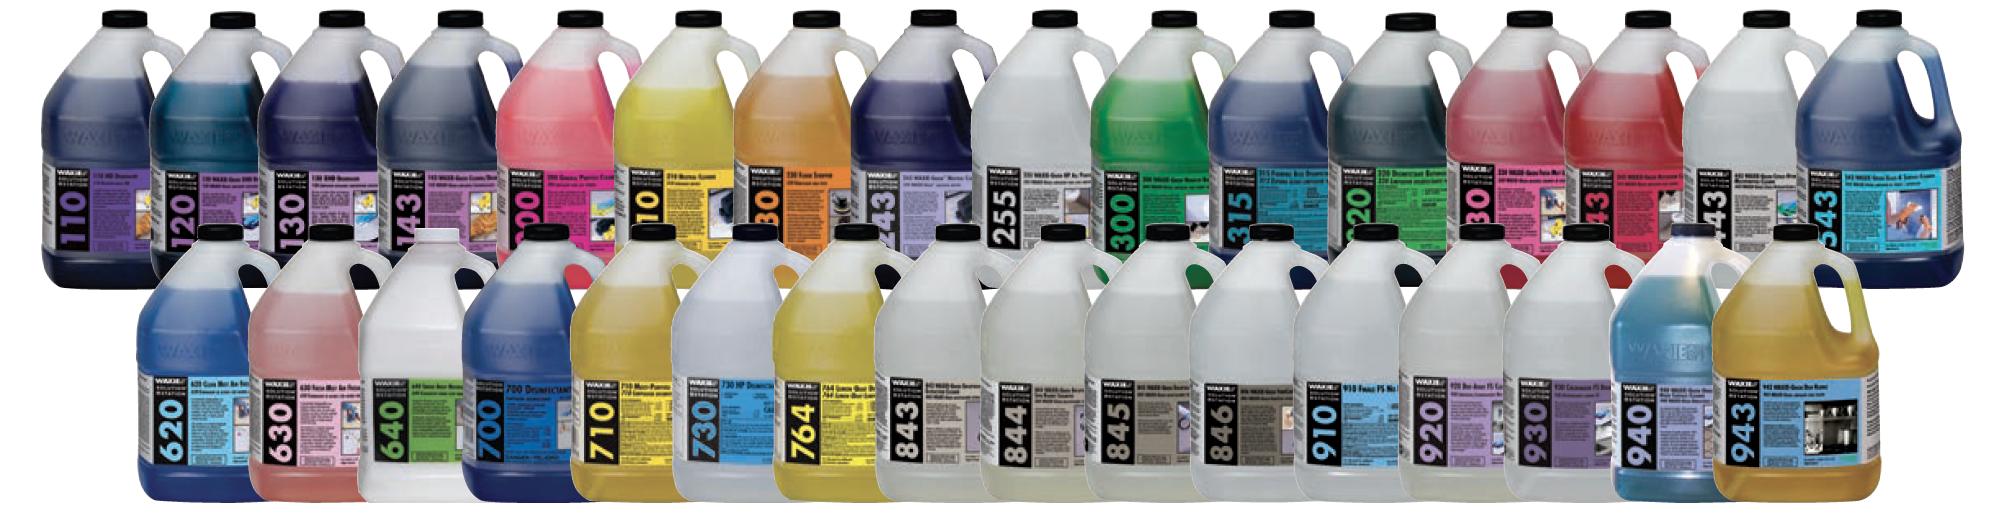 solsta-bottles-2020